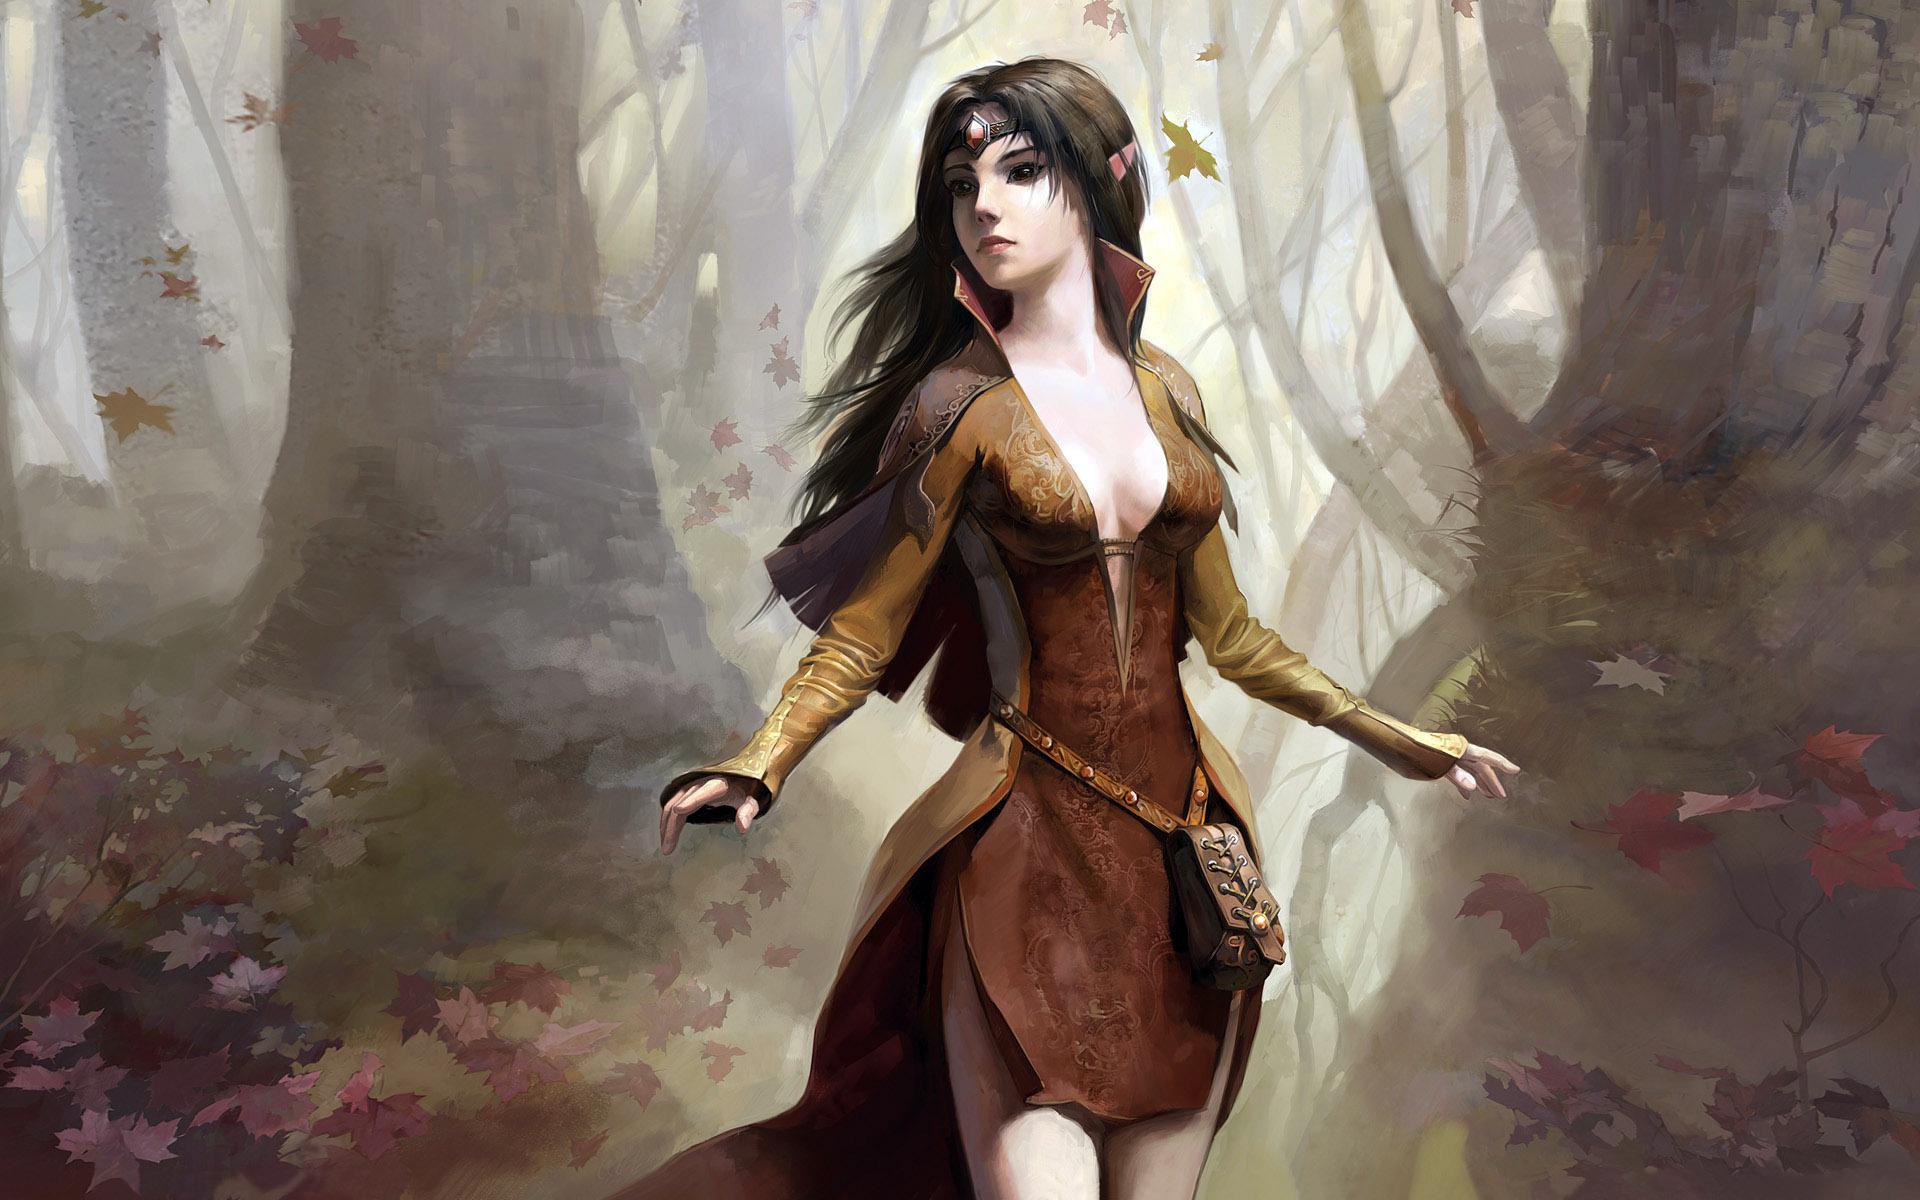 Fantasy Girls Fantasy Girl 3 wallpapers (Desktop, Phone, Tablet ...